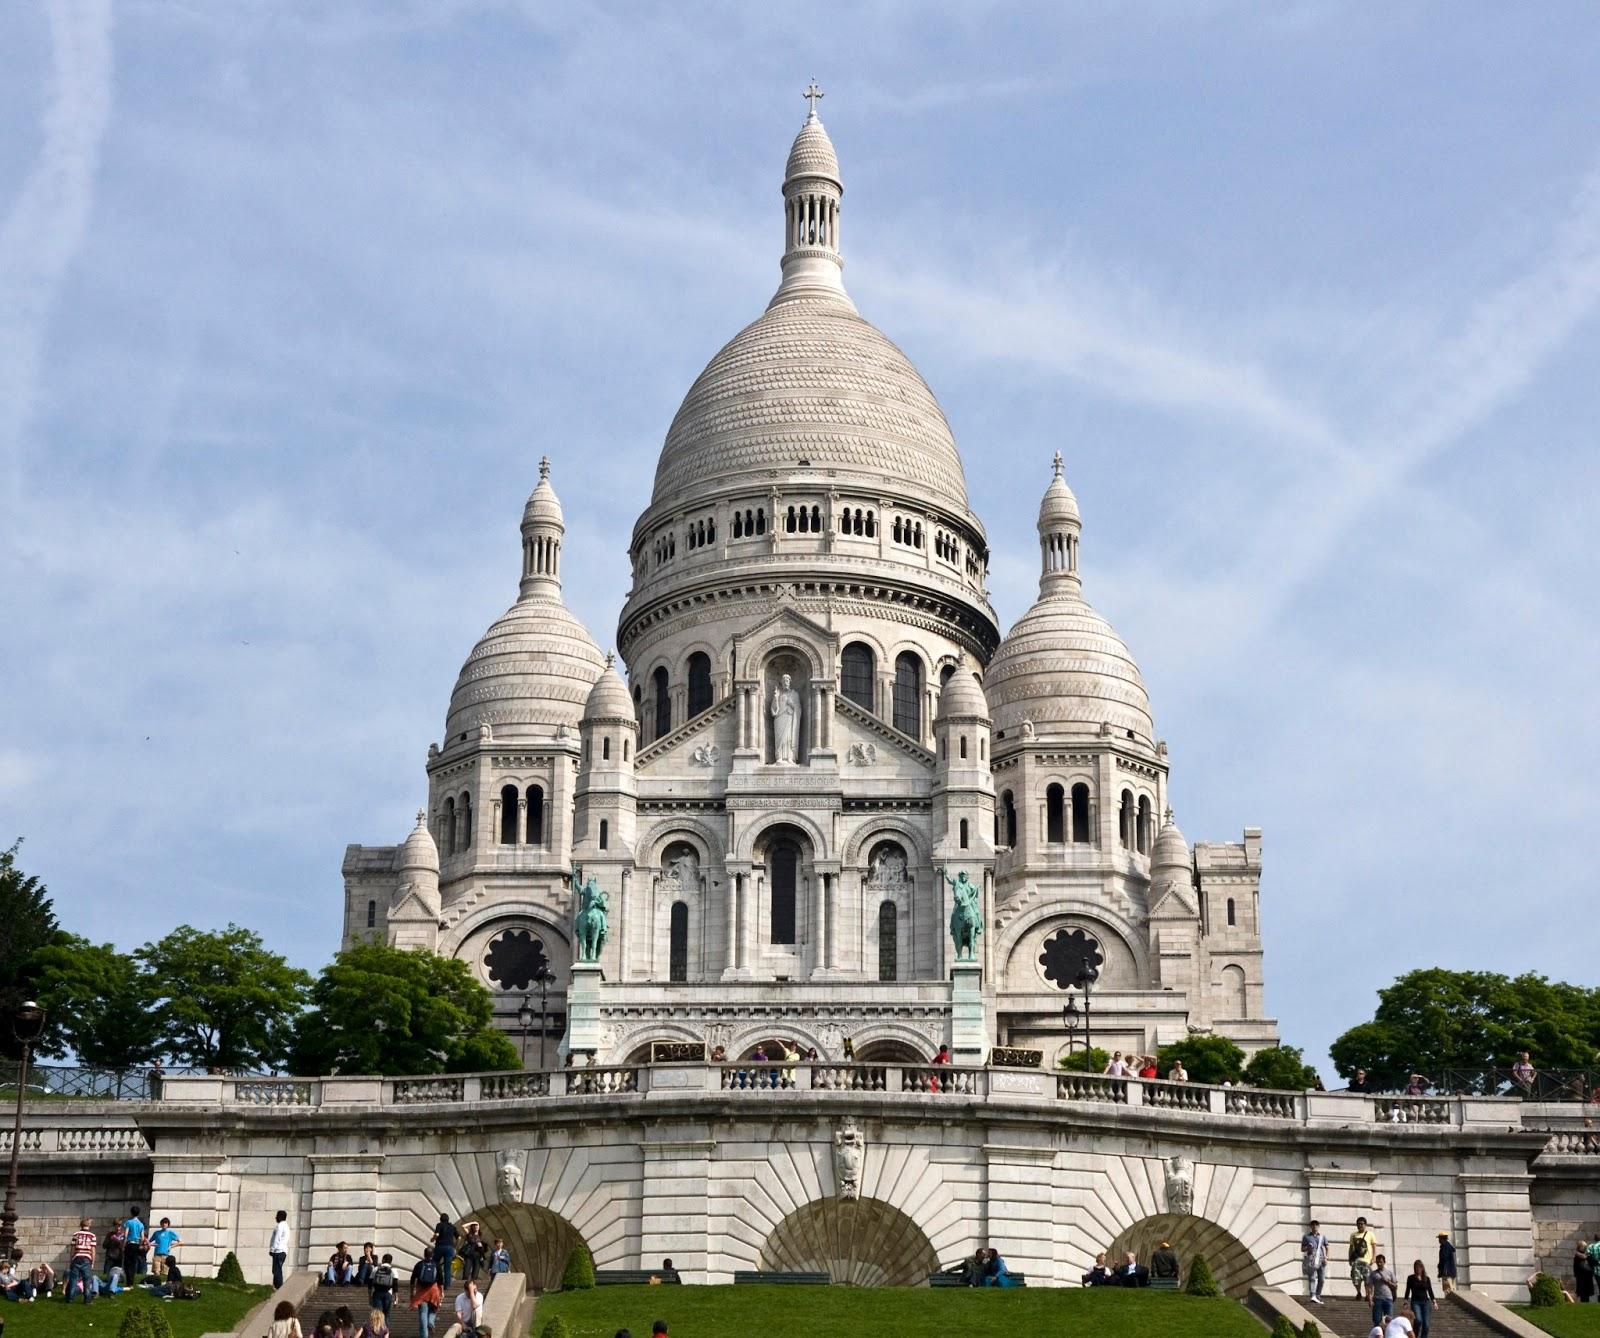 Sacre coeur basilica paris france travel and tourism for Les photos de paris